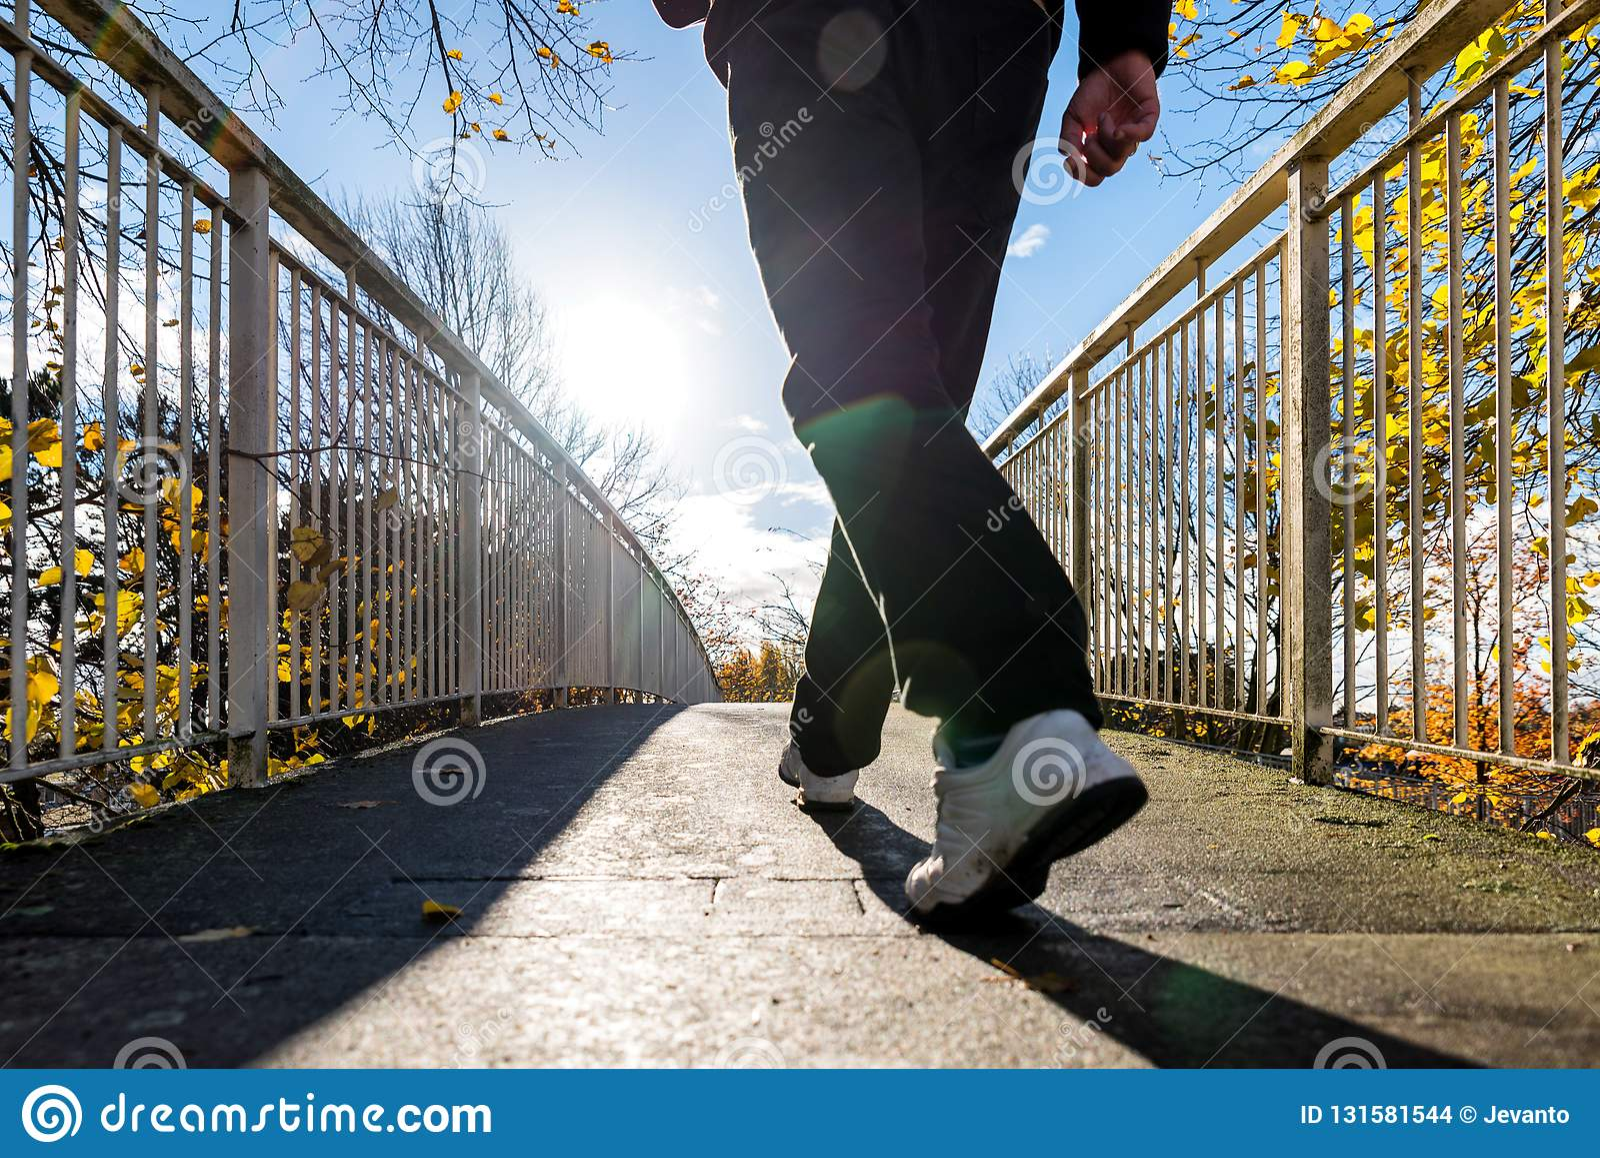 Bright sunny morning view of man walking on pedestrian bridge in british autumn